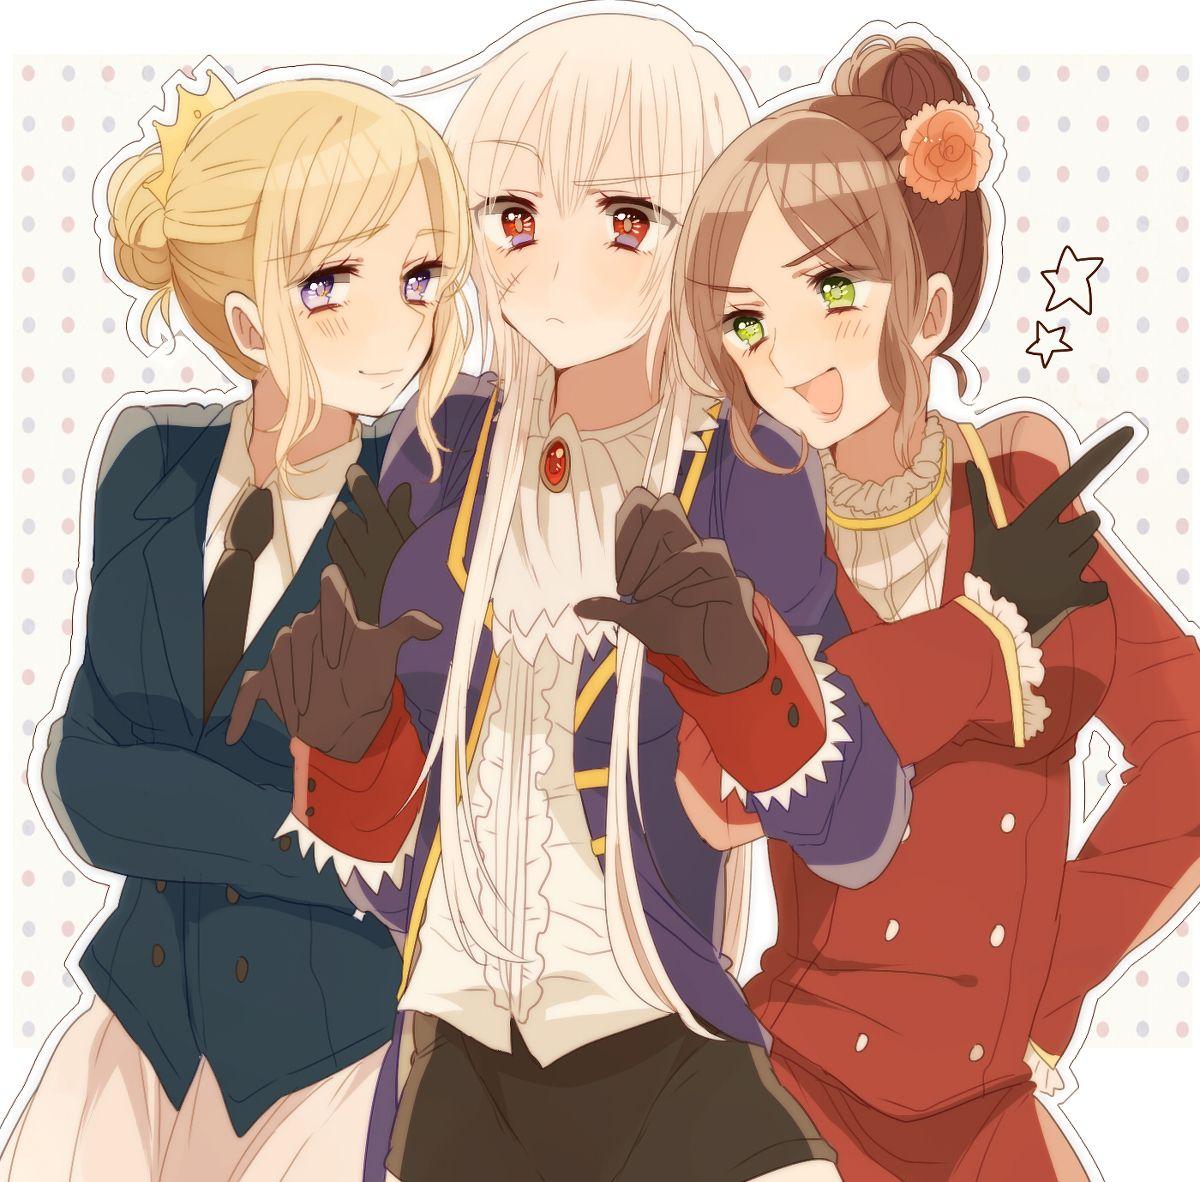 Tags: Axis Powers: Hetalia, Nyotalia, Germanic Countries, Prussia (Female), France (Female), Spain (Female), Ninonuko